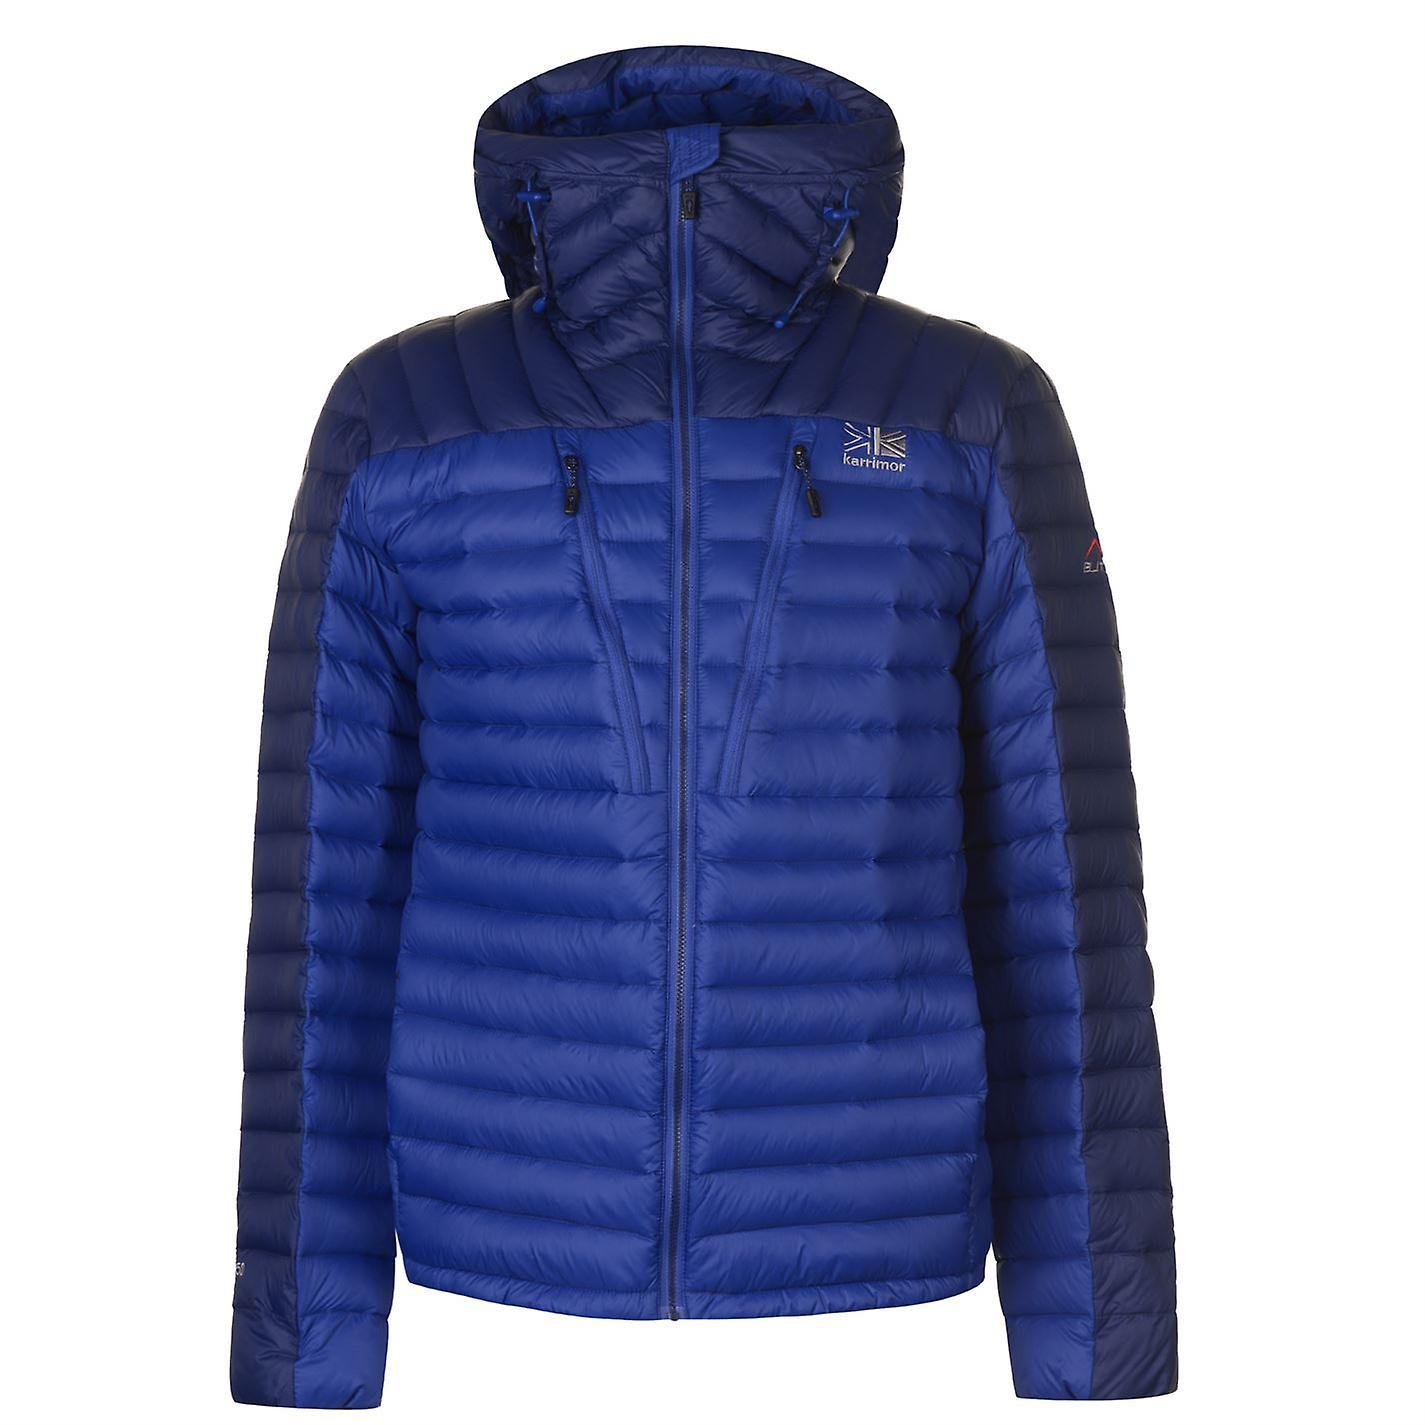 Karrimor Pour des hommes Alpiniste Down veste